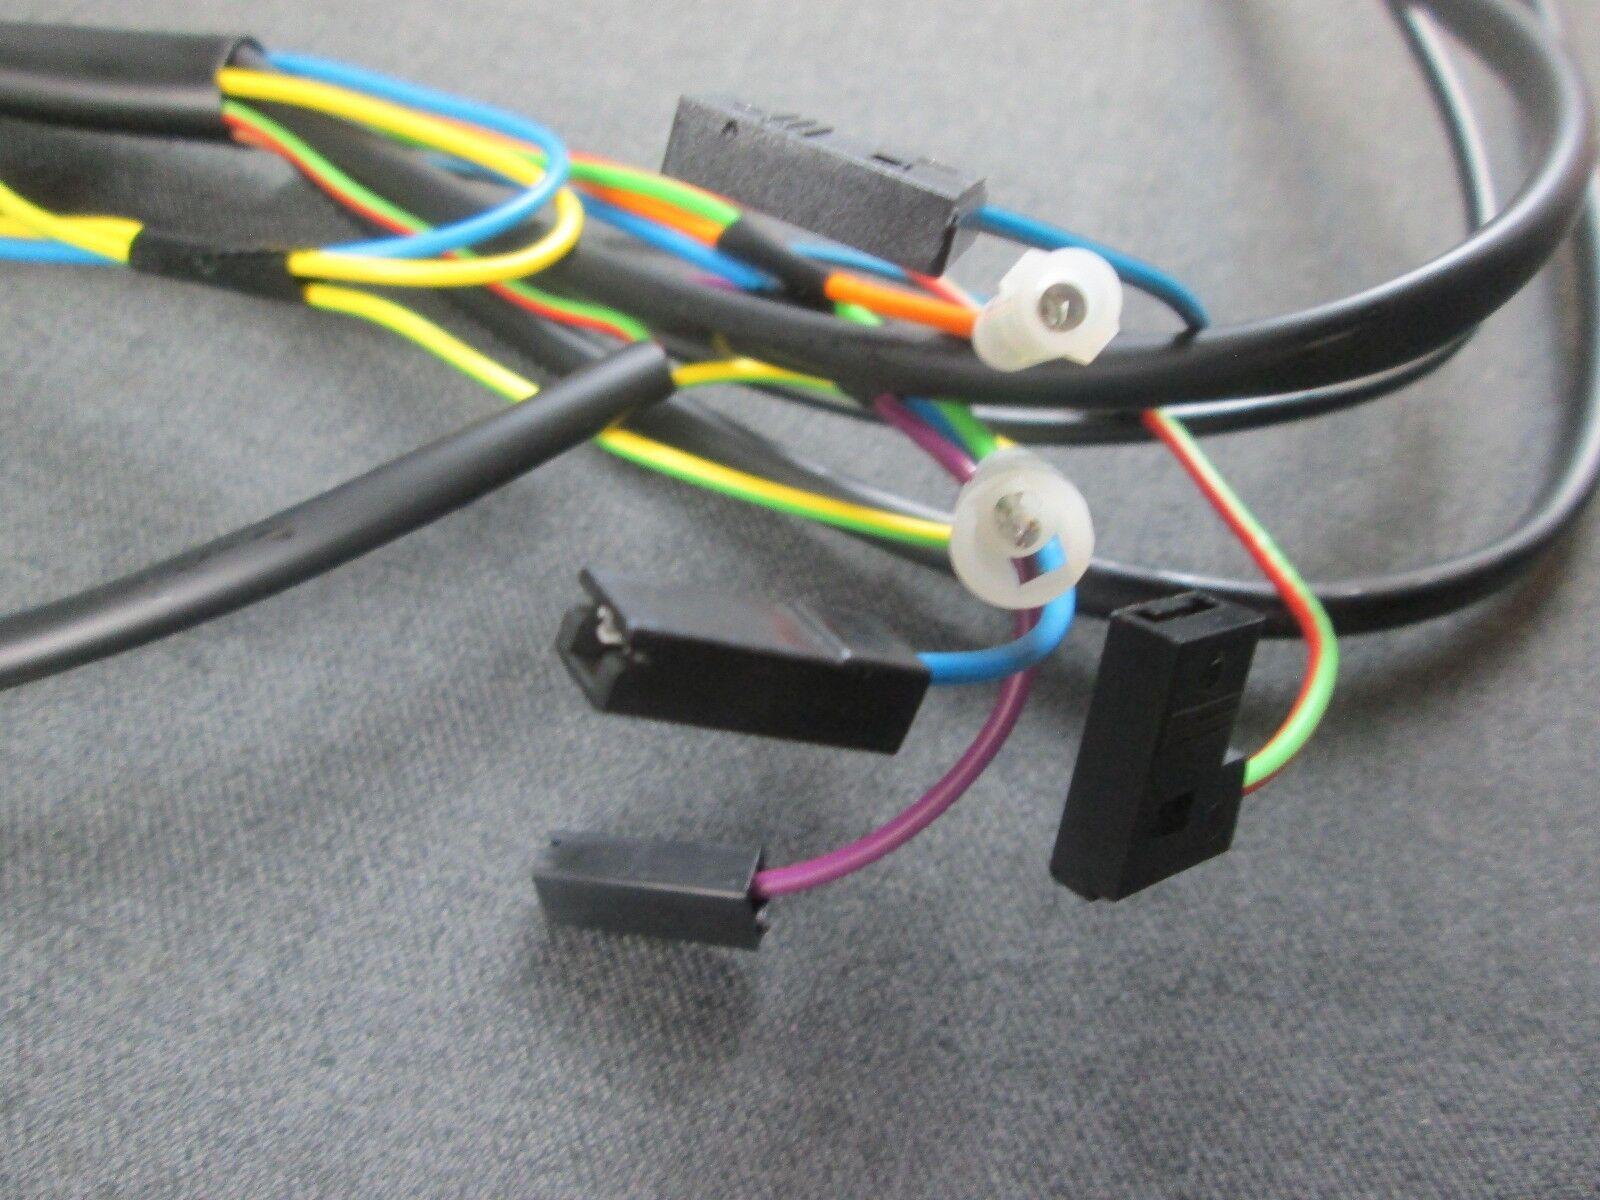 Genine Aprilia Rx 50 1989 Main Wiring Harness Ap8212284 Mt Ebay Norton Secured Powered By Verisign